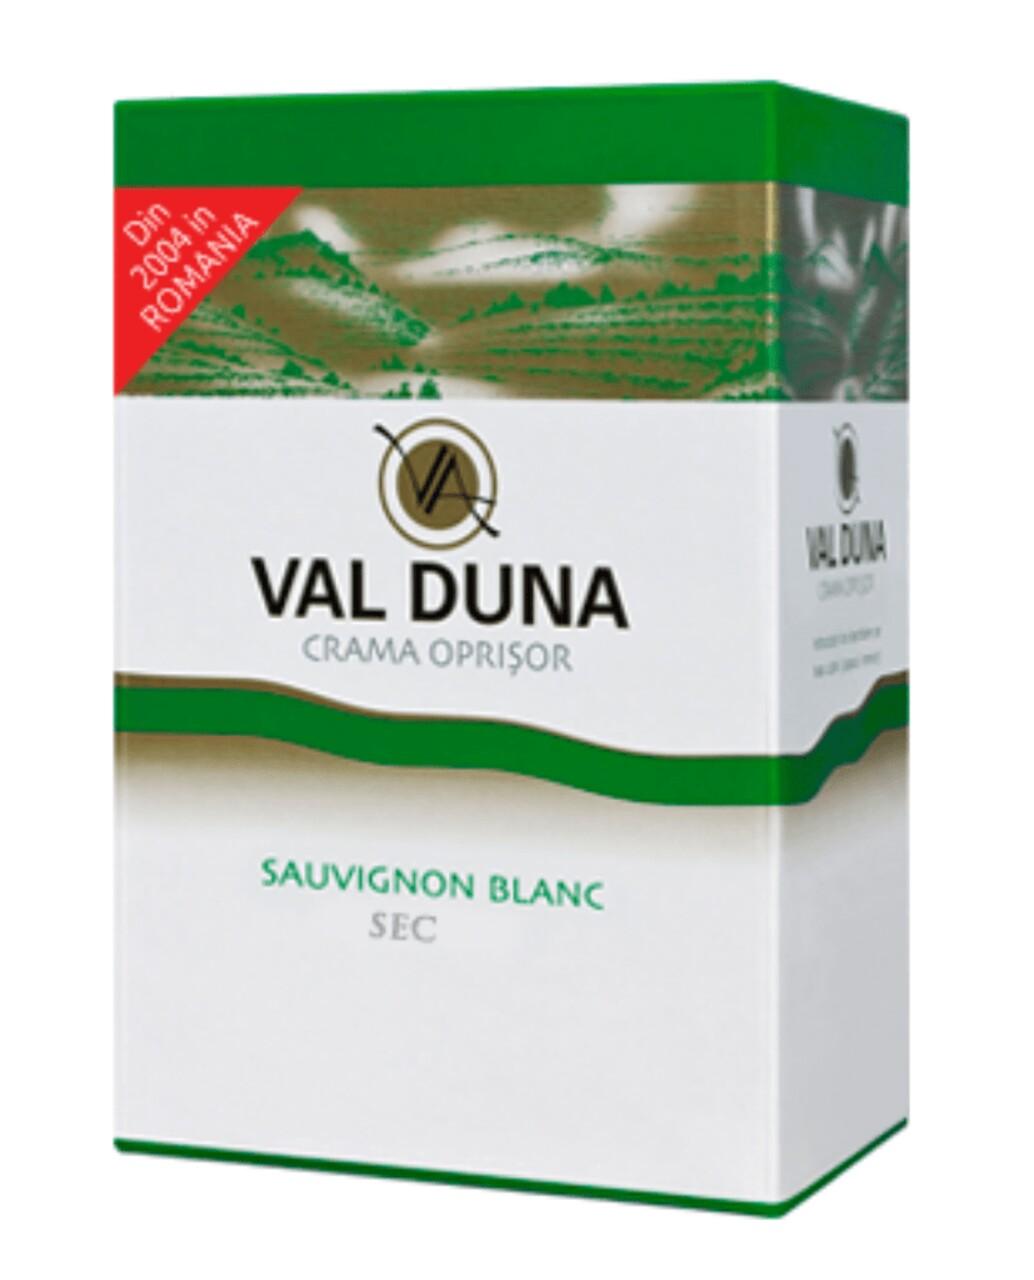 Oprisor Val Duna Sauvignon Blanc BIB 5L